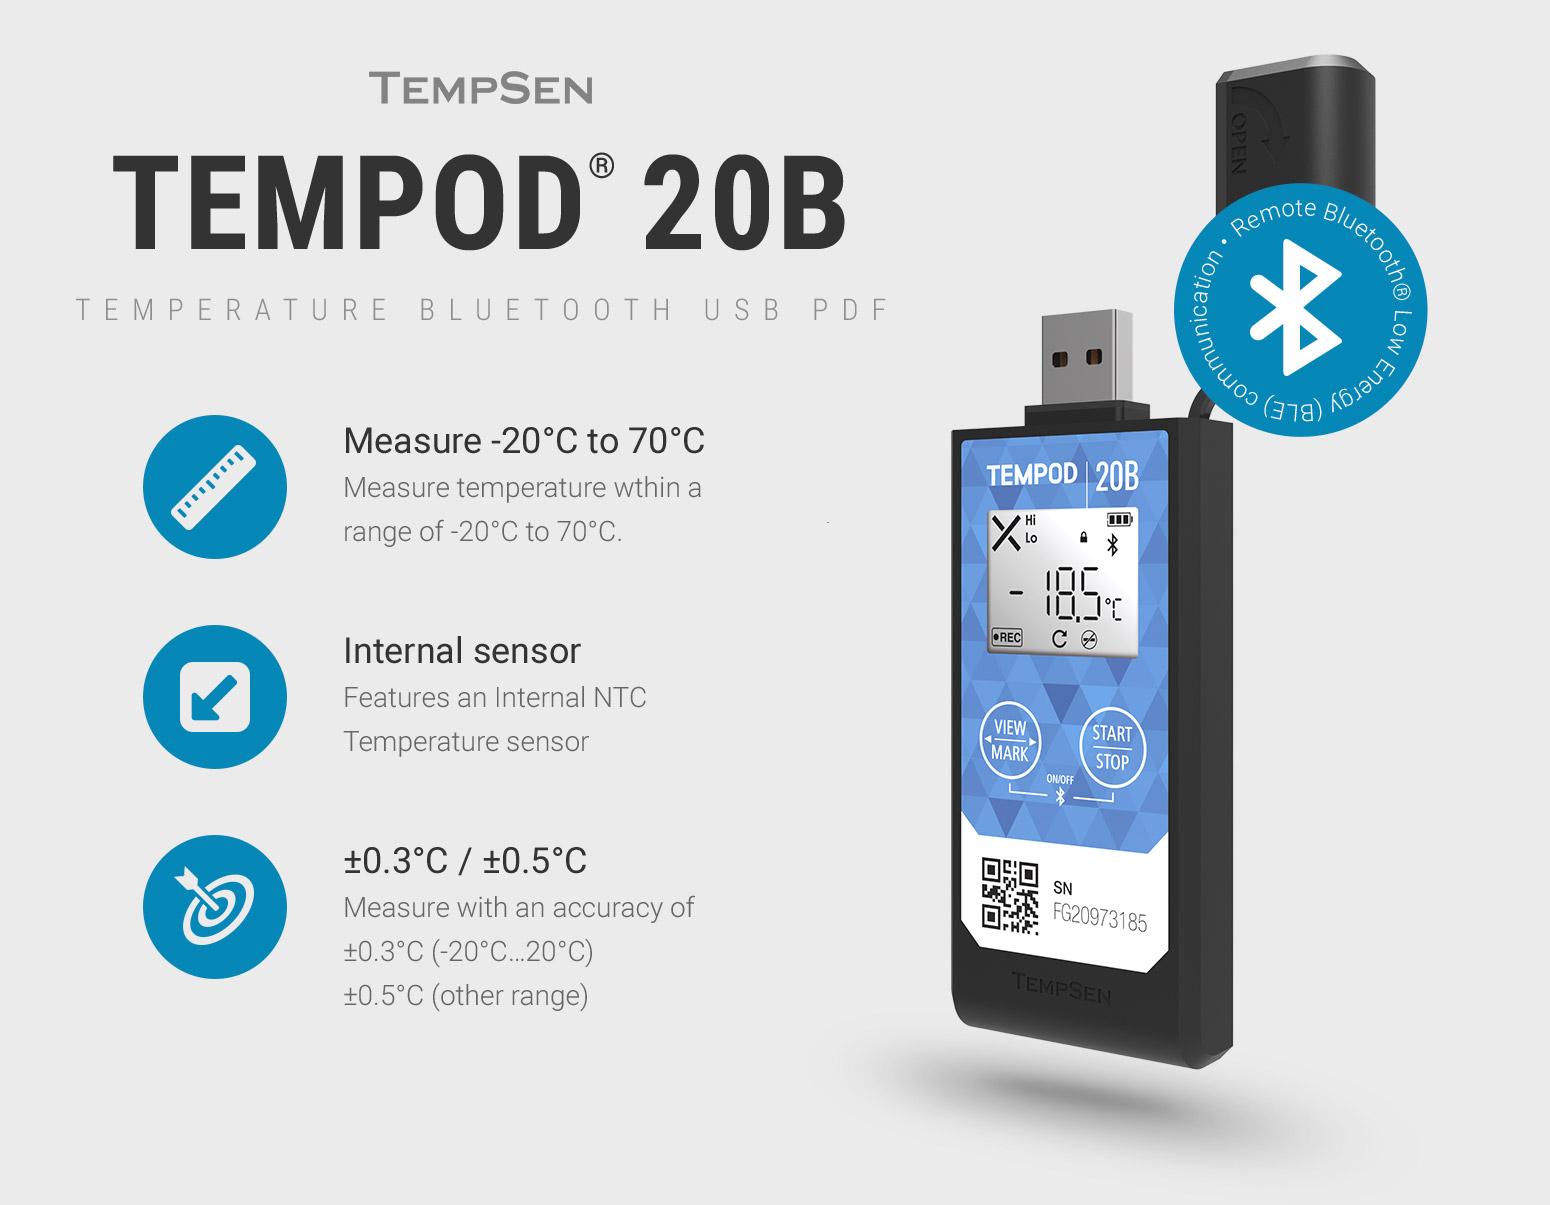 product-image-tempod-20B